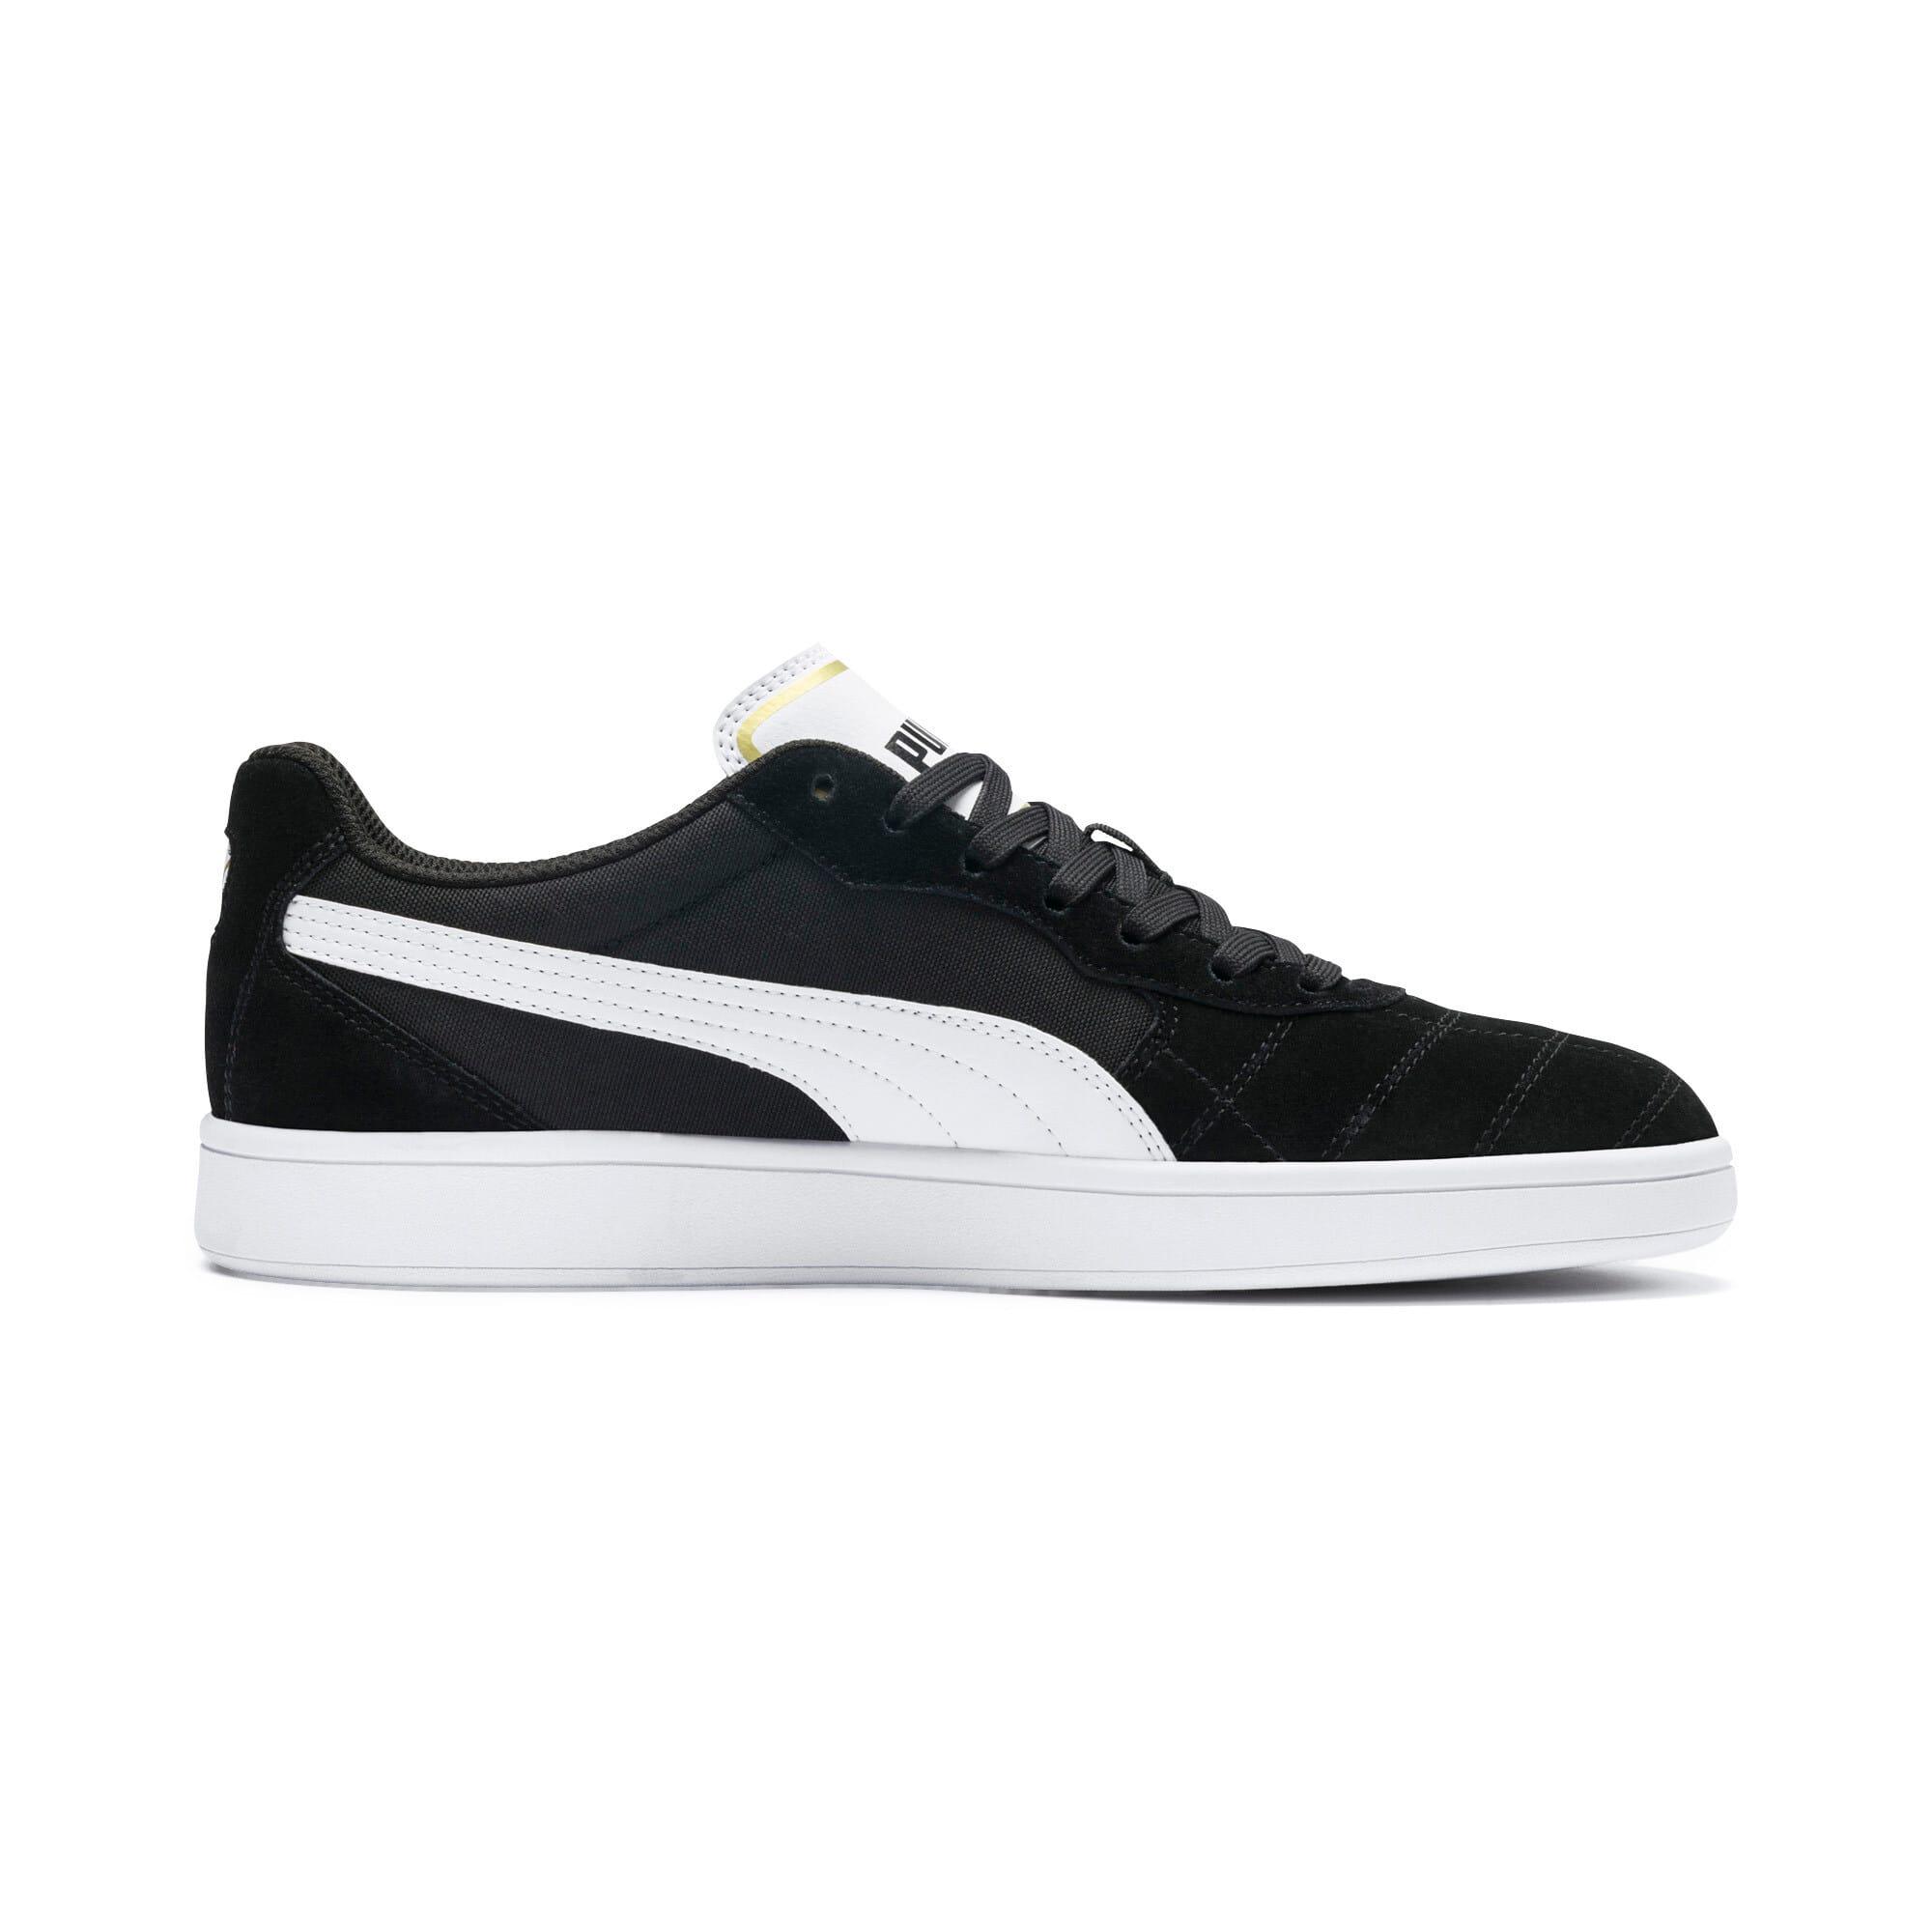 Thumbnail 6 of Astro Kick Sneakers, Puma Black-Puma White, medium